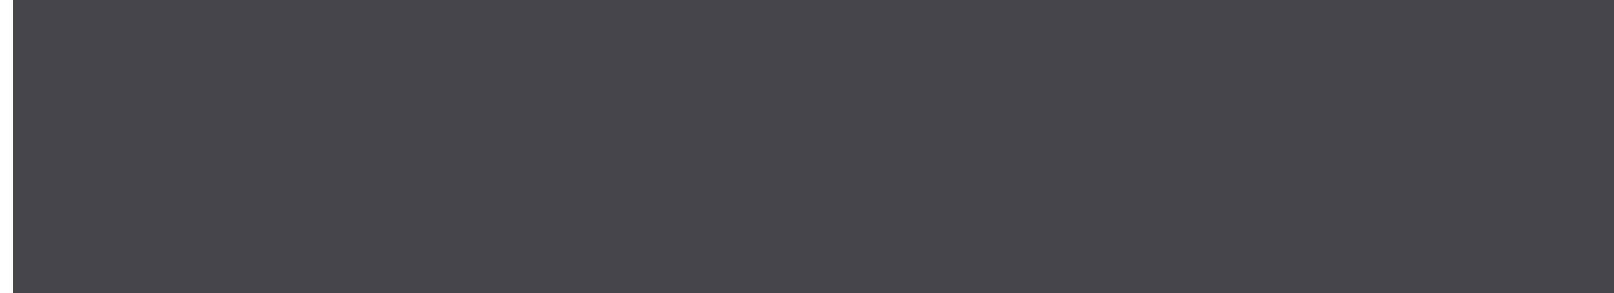 Seven Hills Wheelman logotype diagram